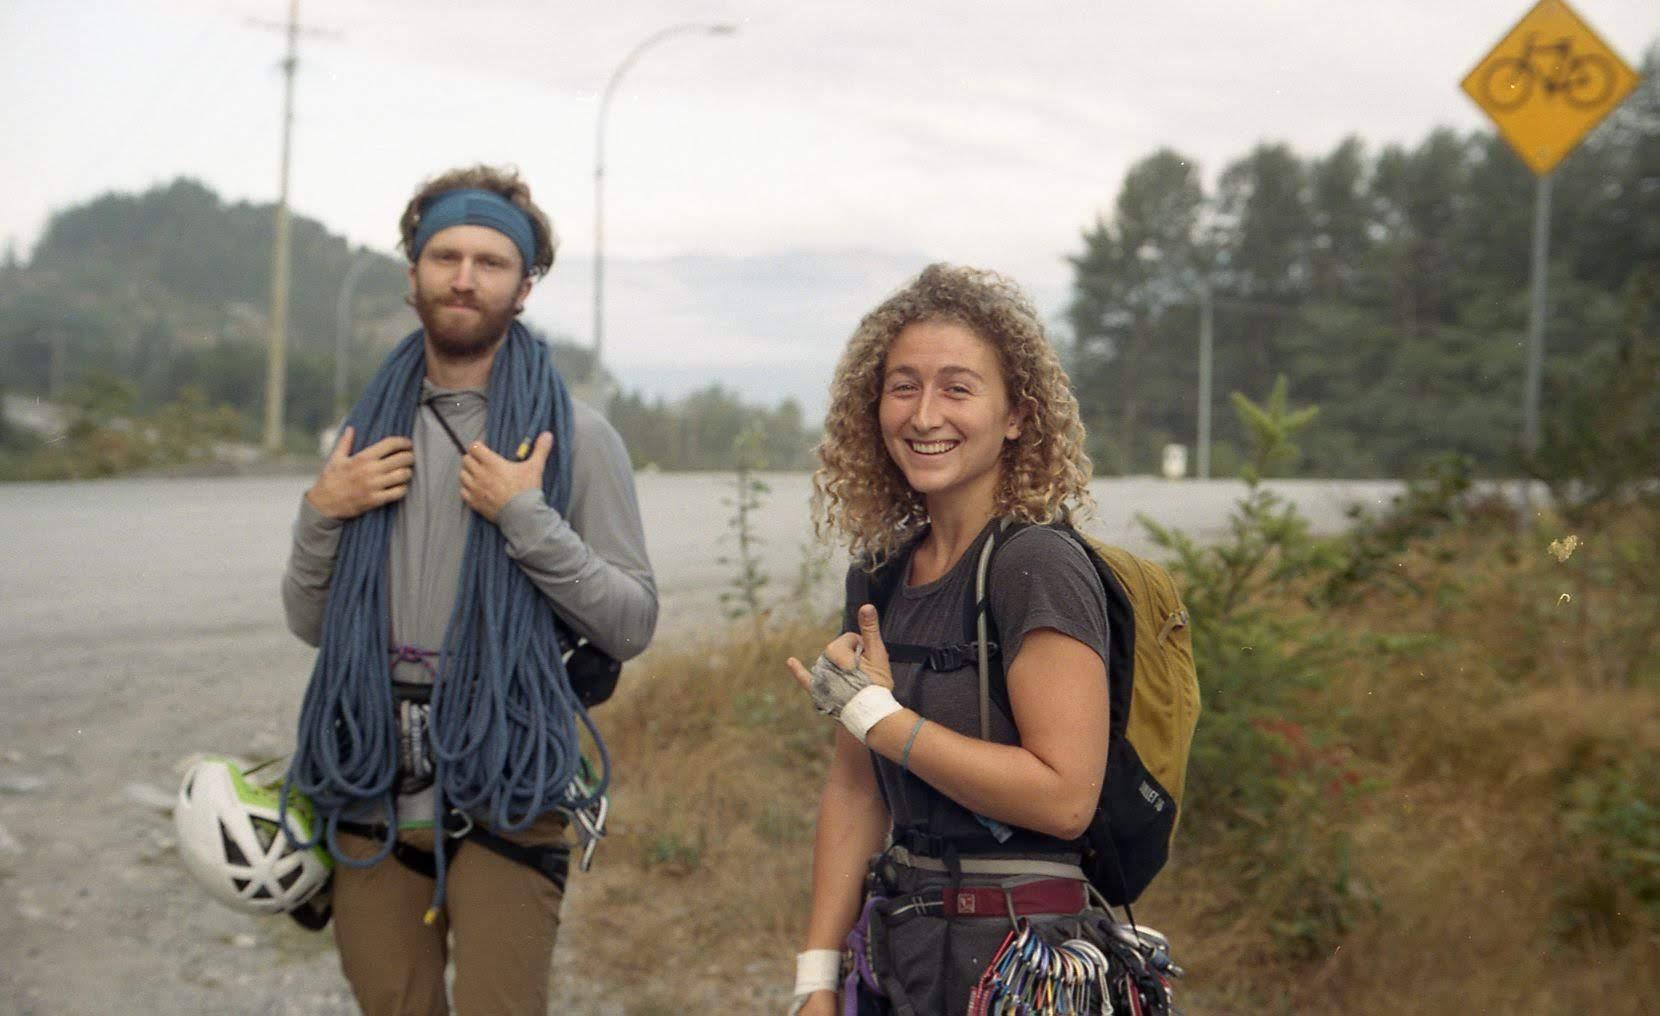 Kaya and Alex climbing in Squamish